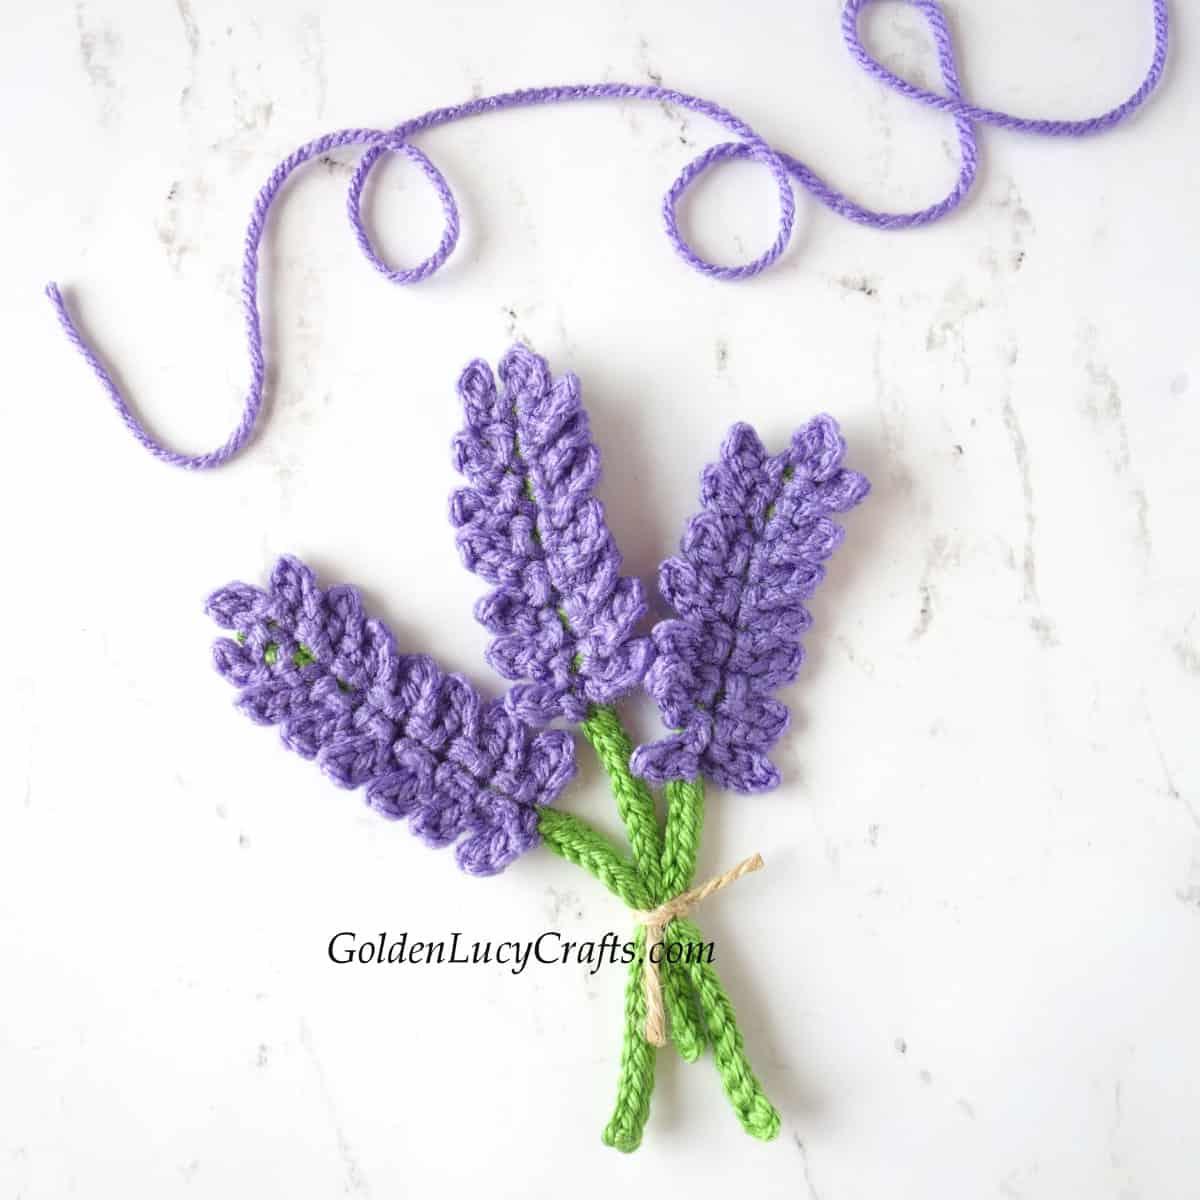 Crocheted lavender applique.